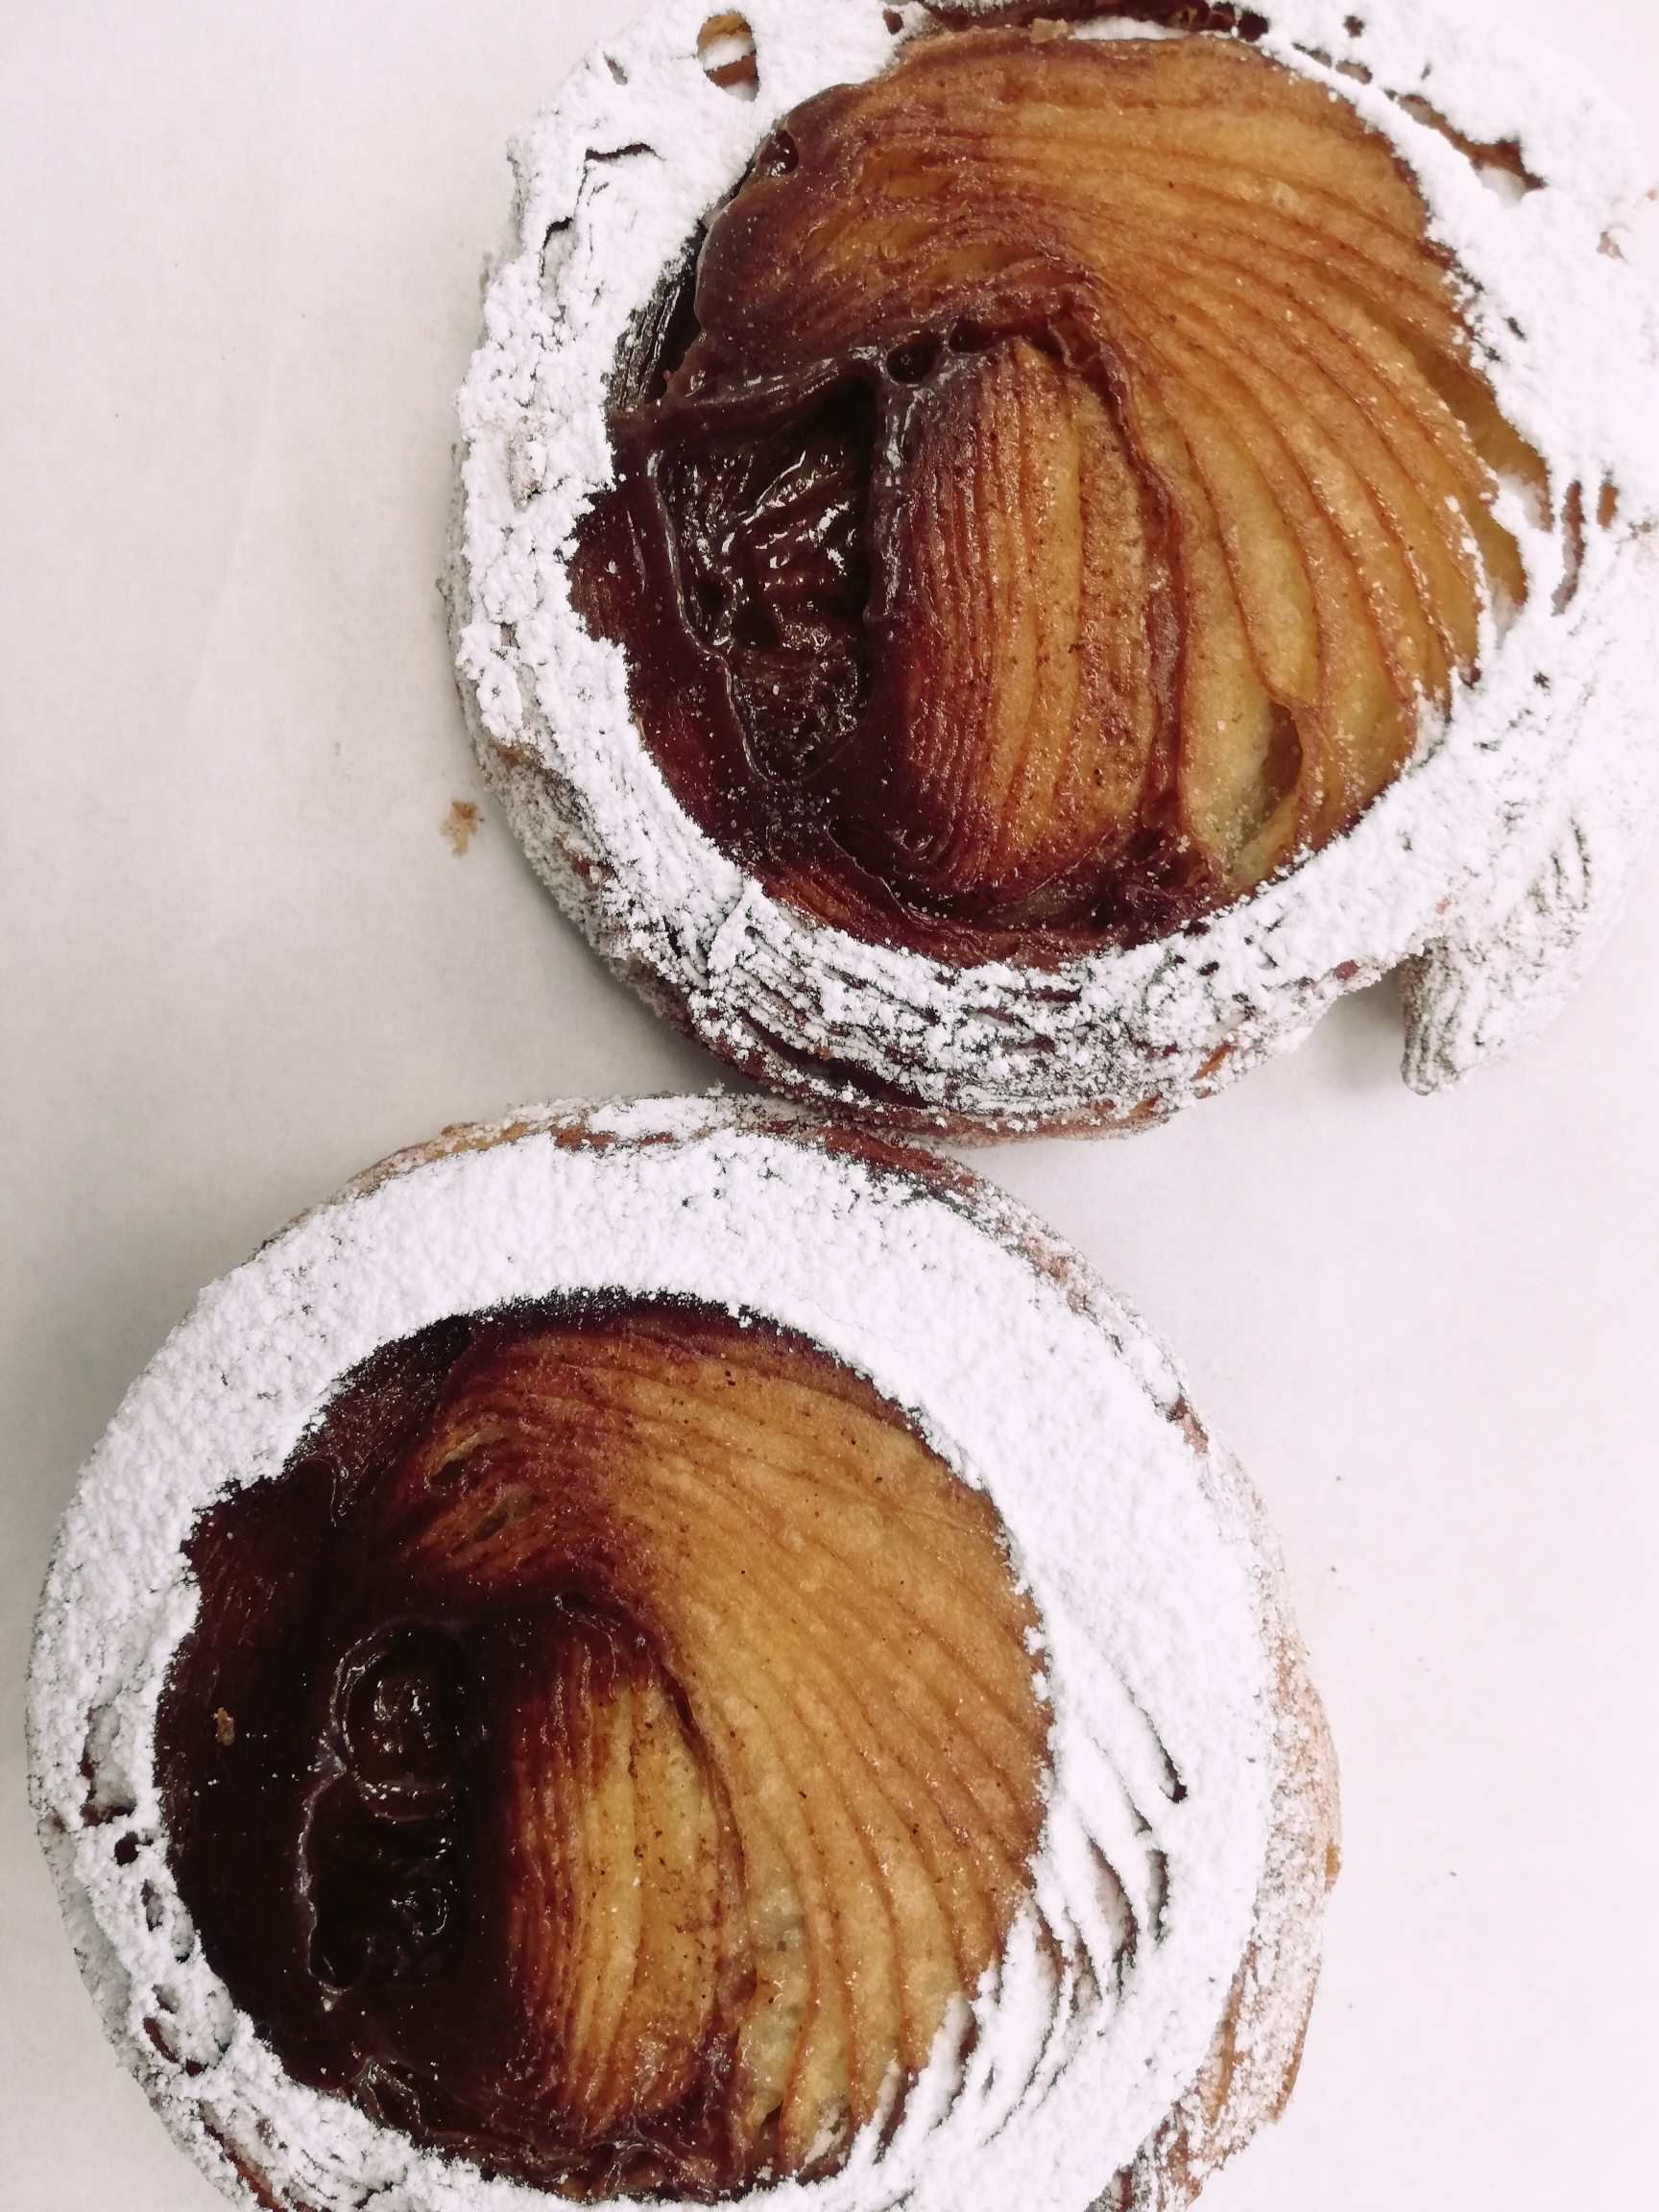 (FRI) Cinnamon Swirl